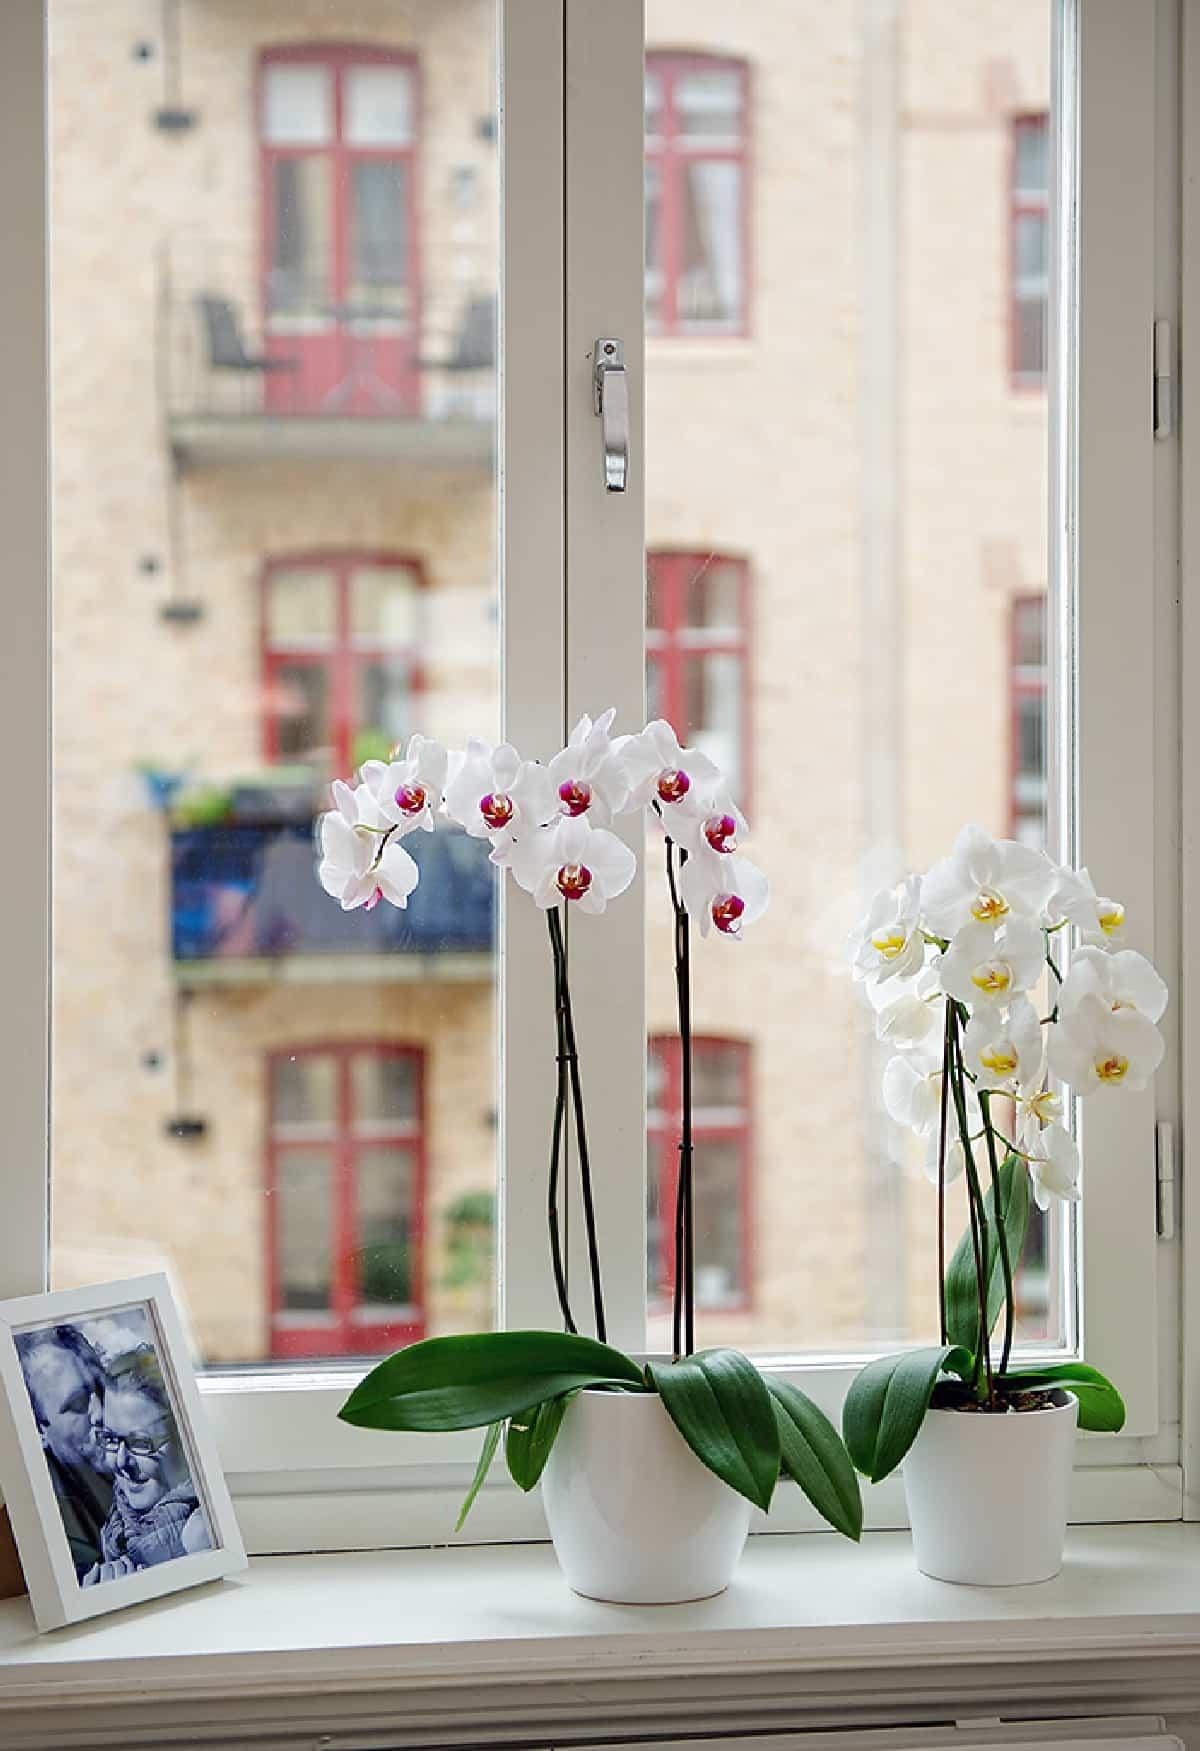 claves para decorar con orquideas tu hogar 14